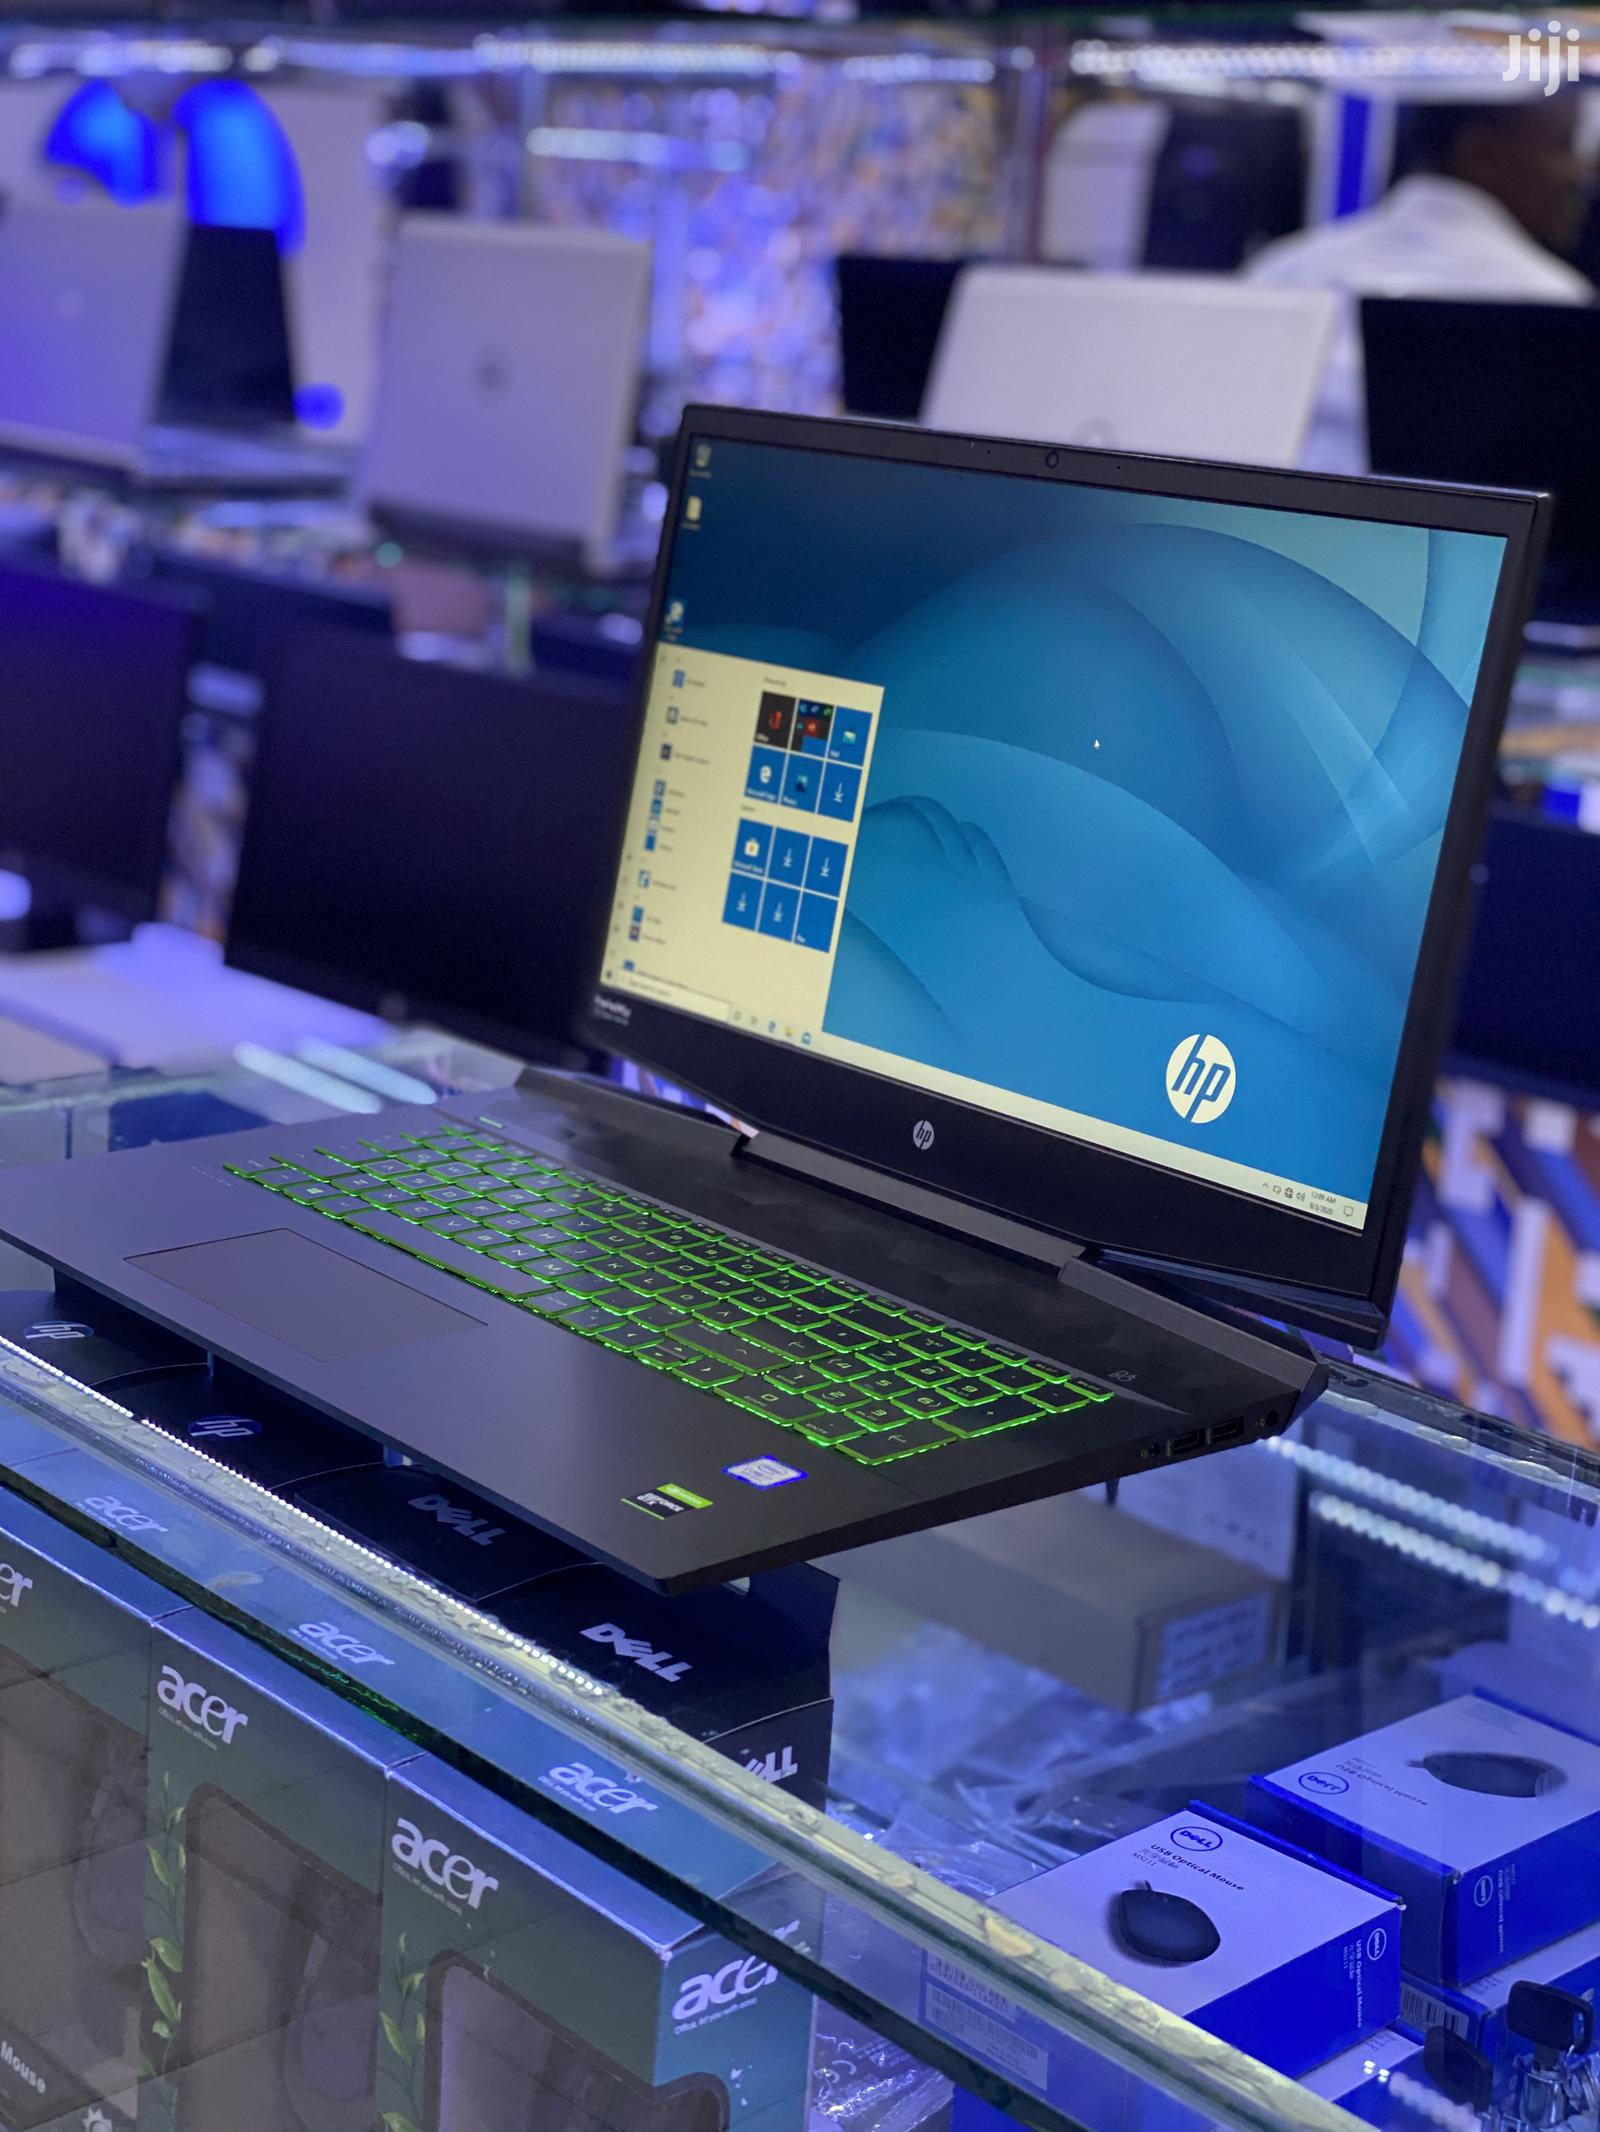 New Laptop HP Pavilion 17t 16GB Intel Core i7 SSHD (Hybrid) 512GB